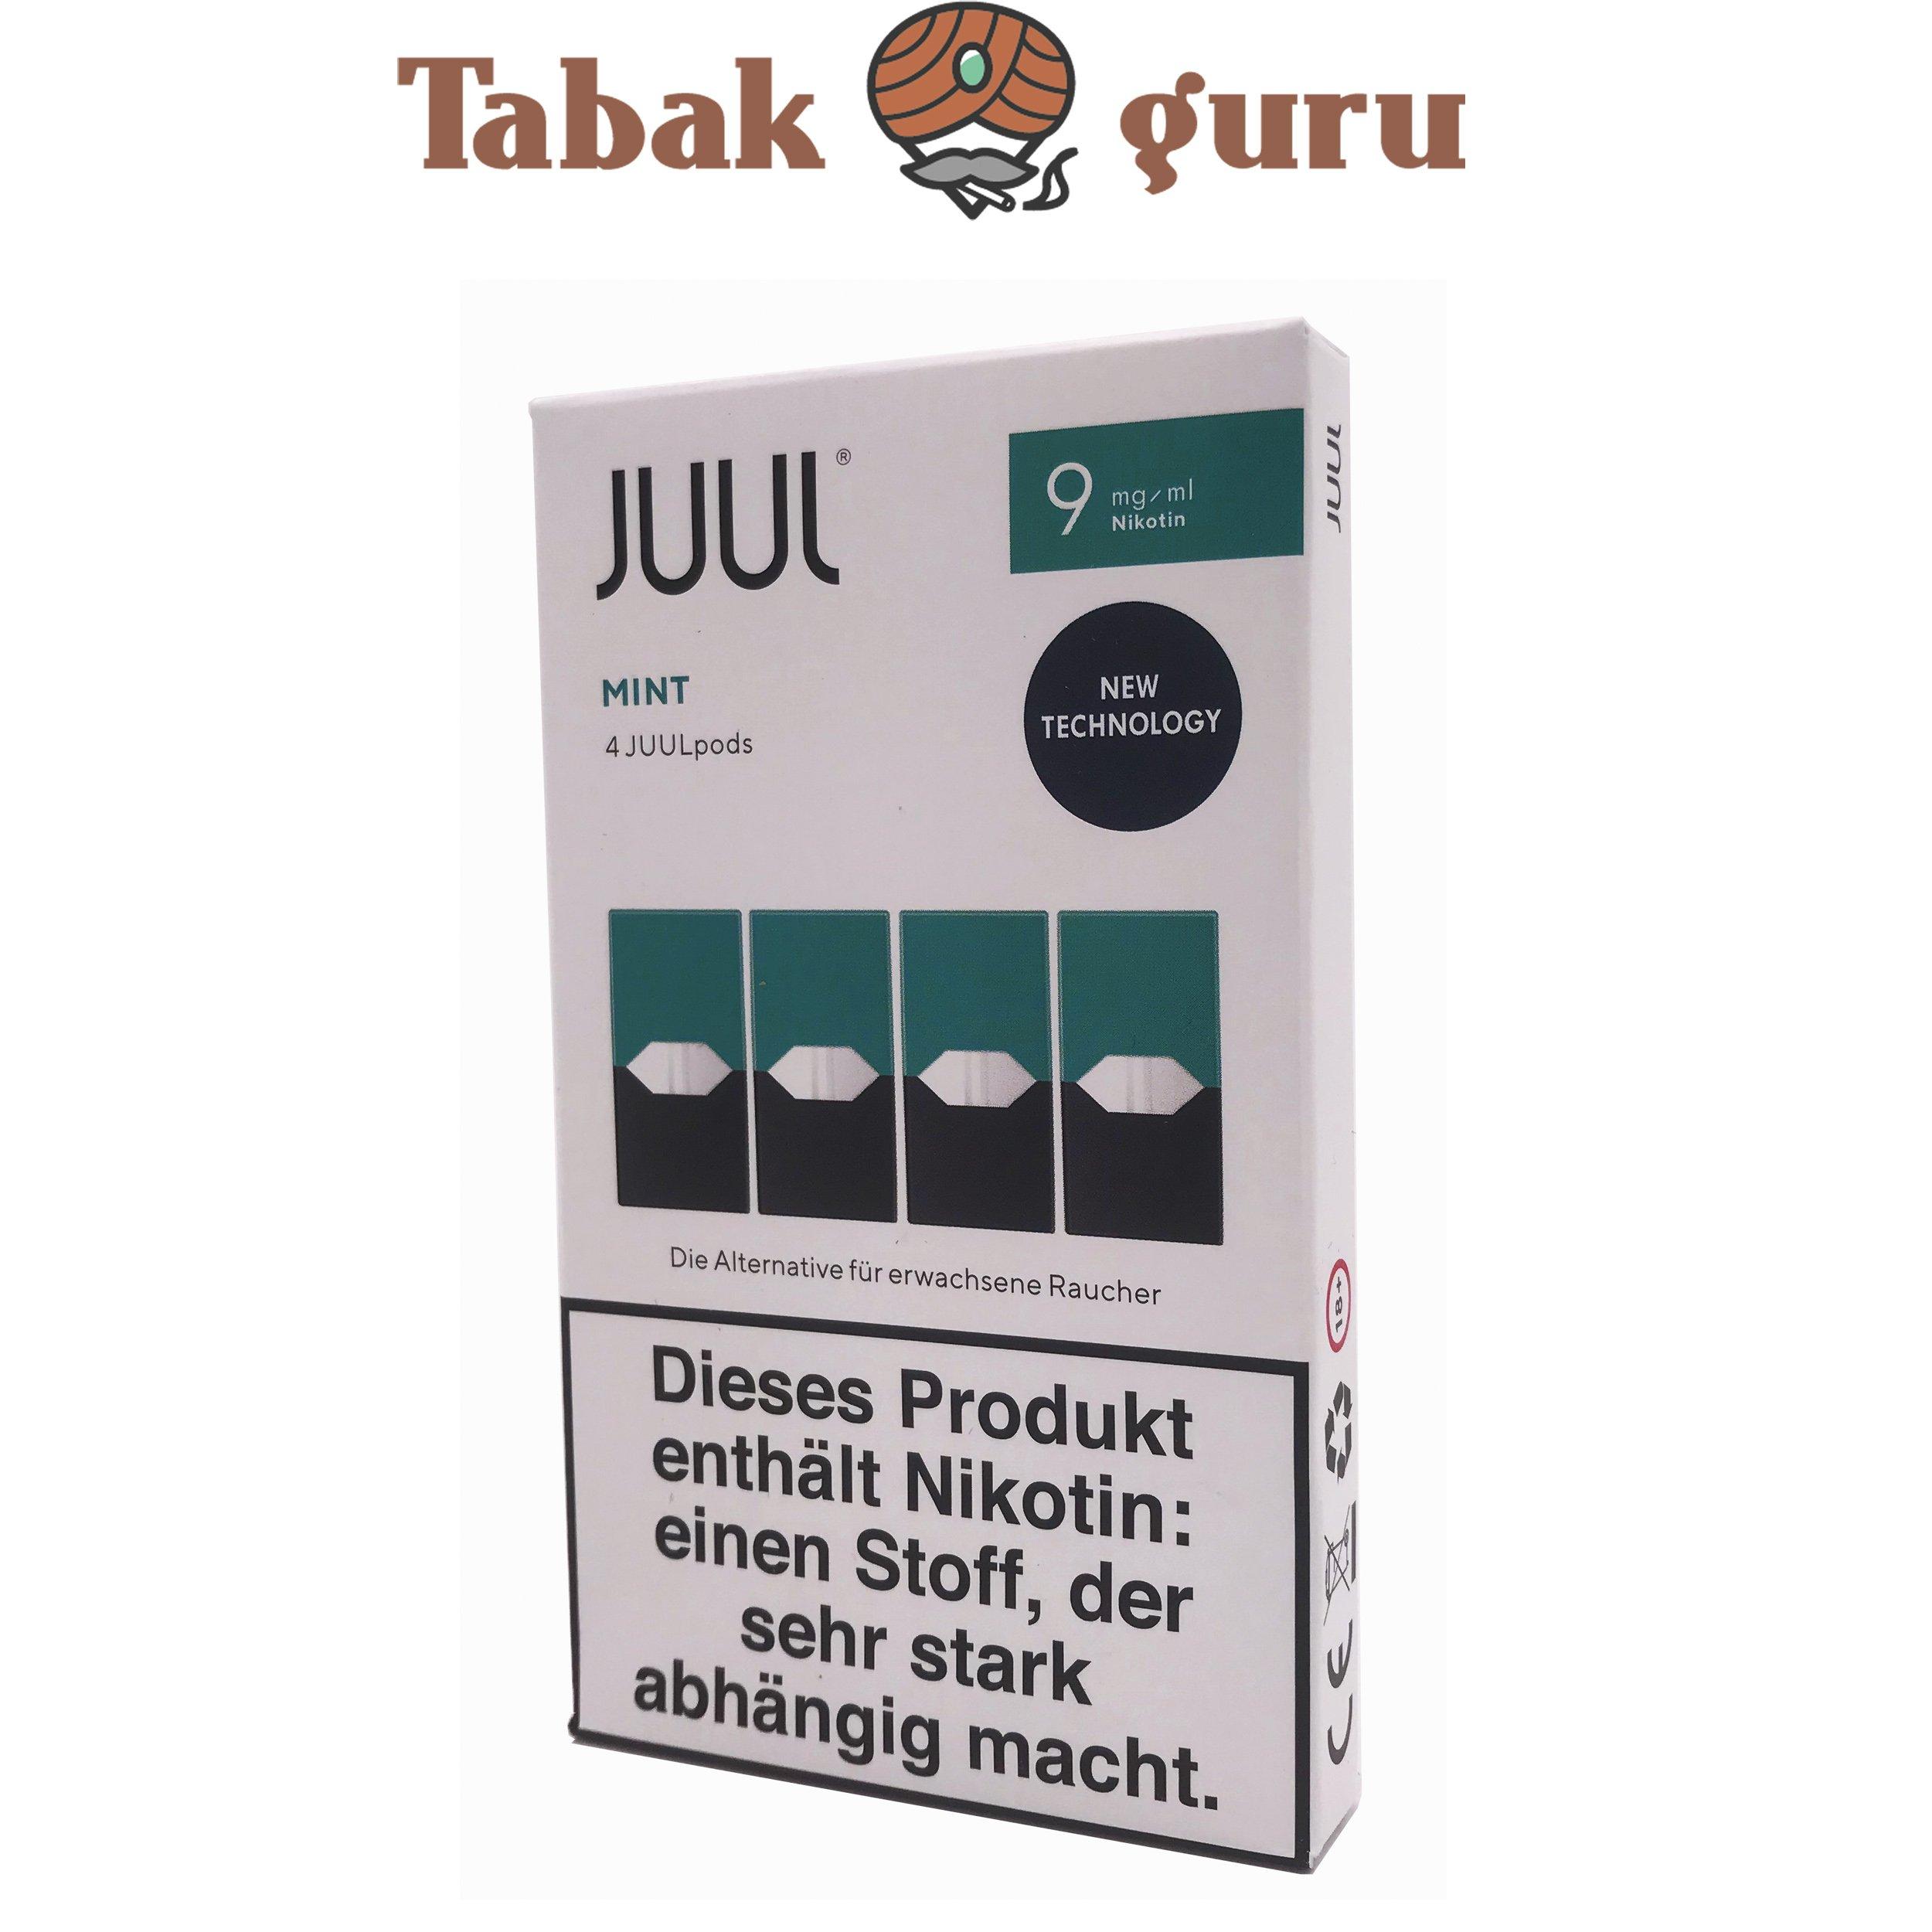 JUUL Mango, Rich Tobacco, Mint Pods 9mg/ml á 4 Pods